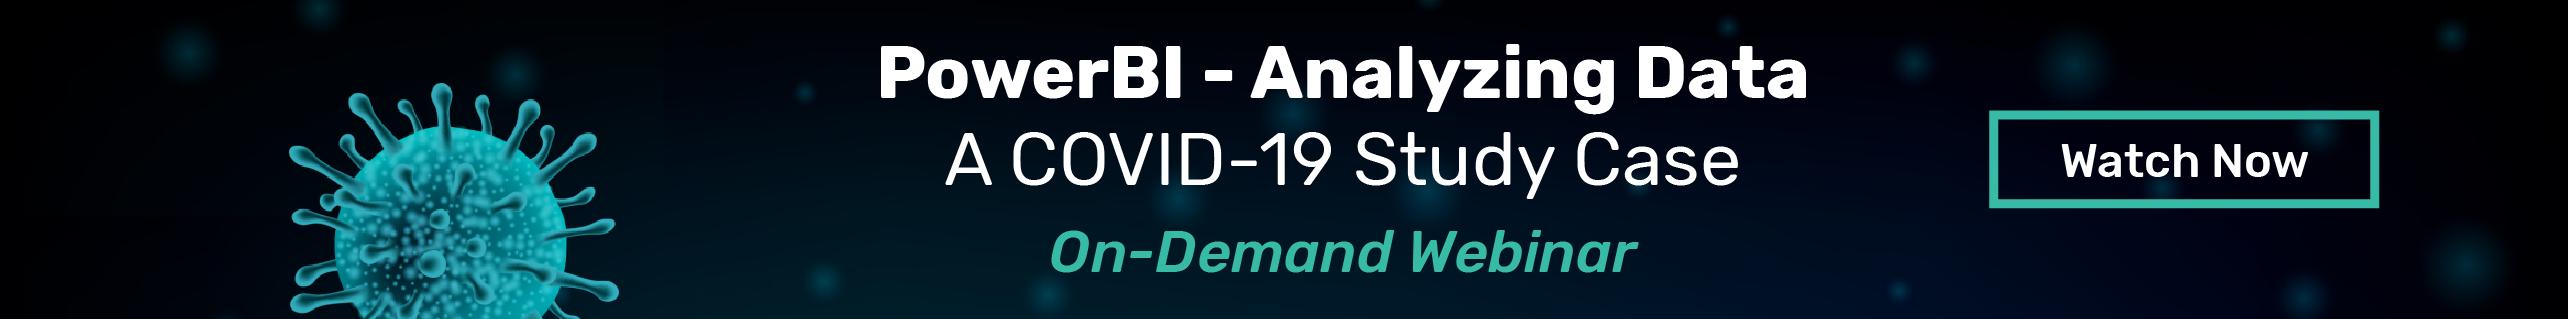 PowerBI - A Covid 19 Study Case